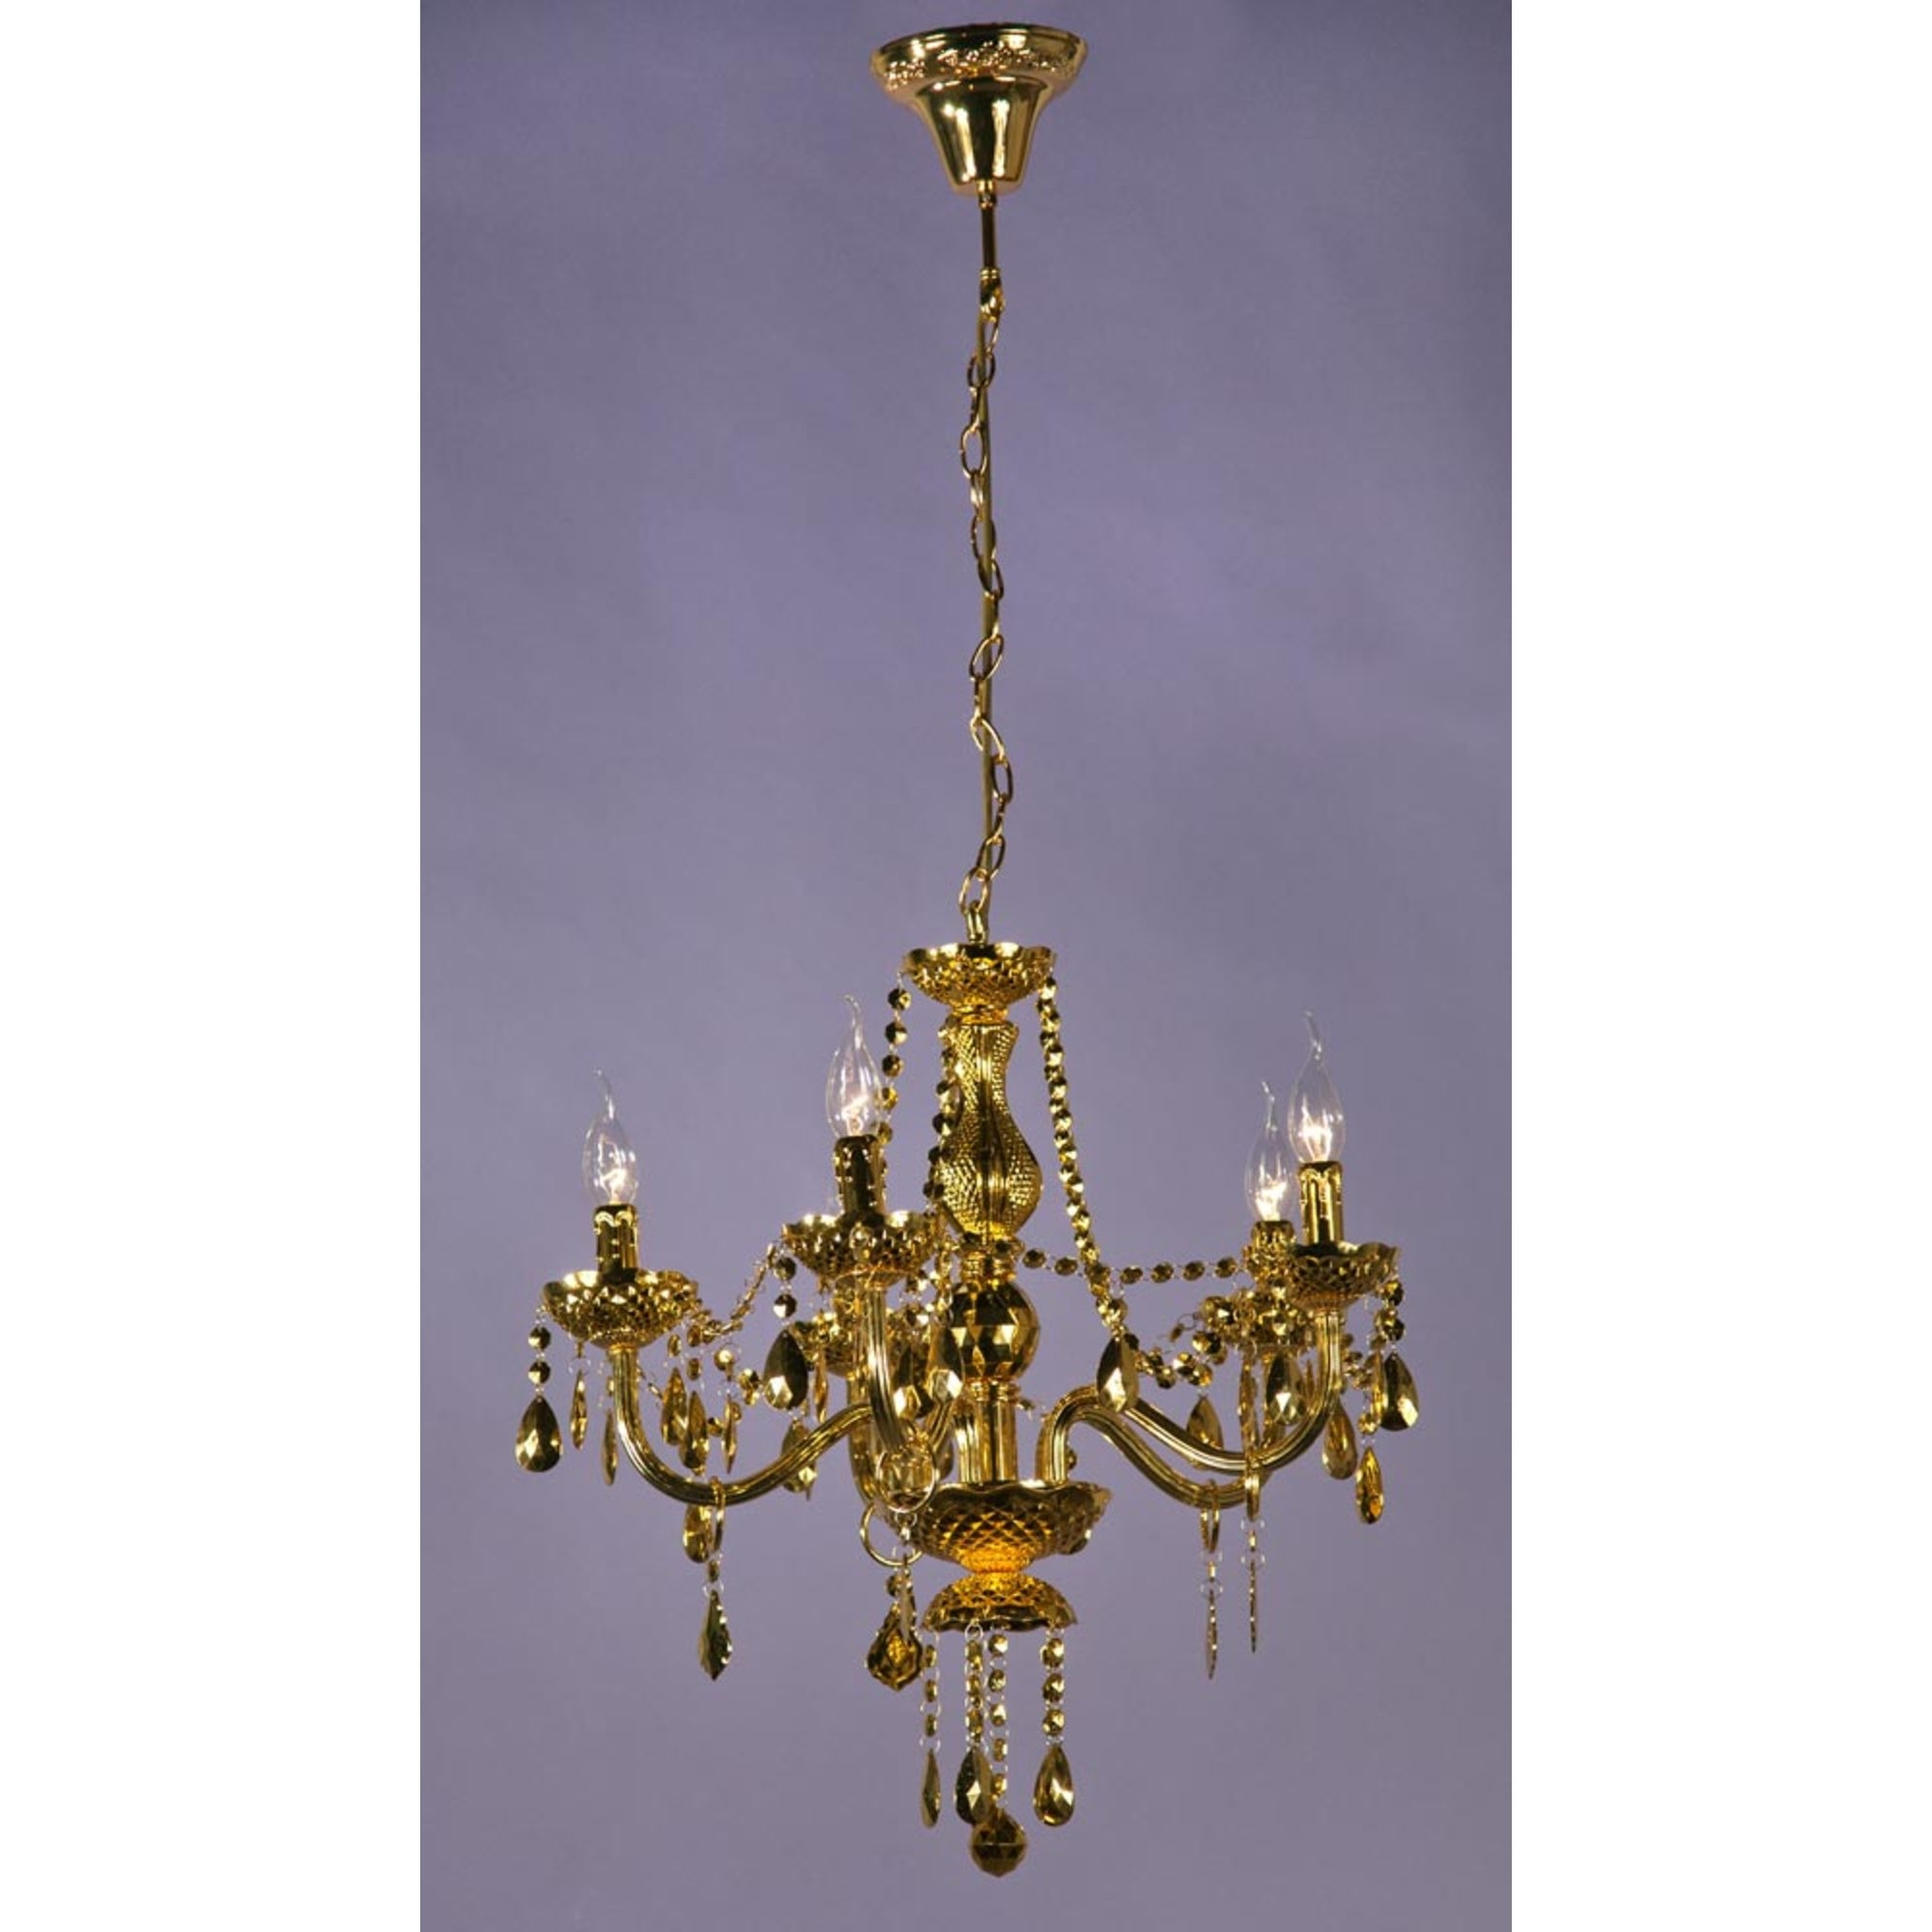 Glimmer 5 Light Chandelier - Gold